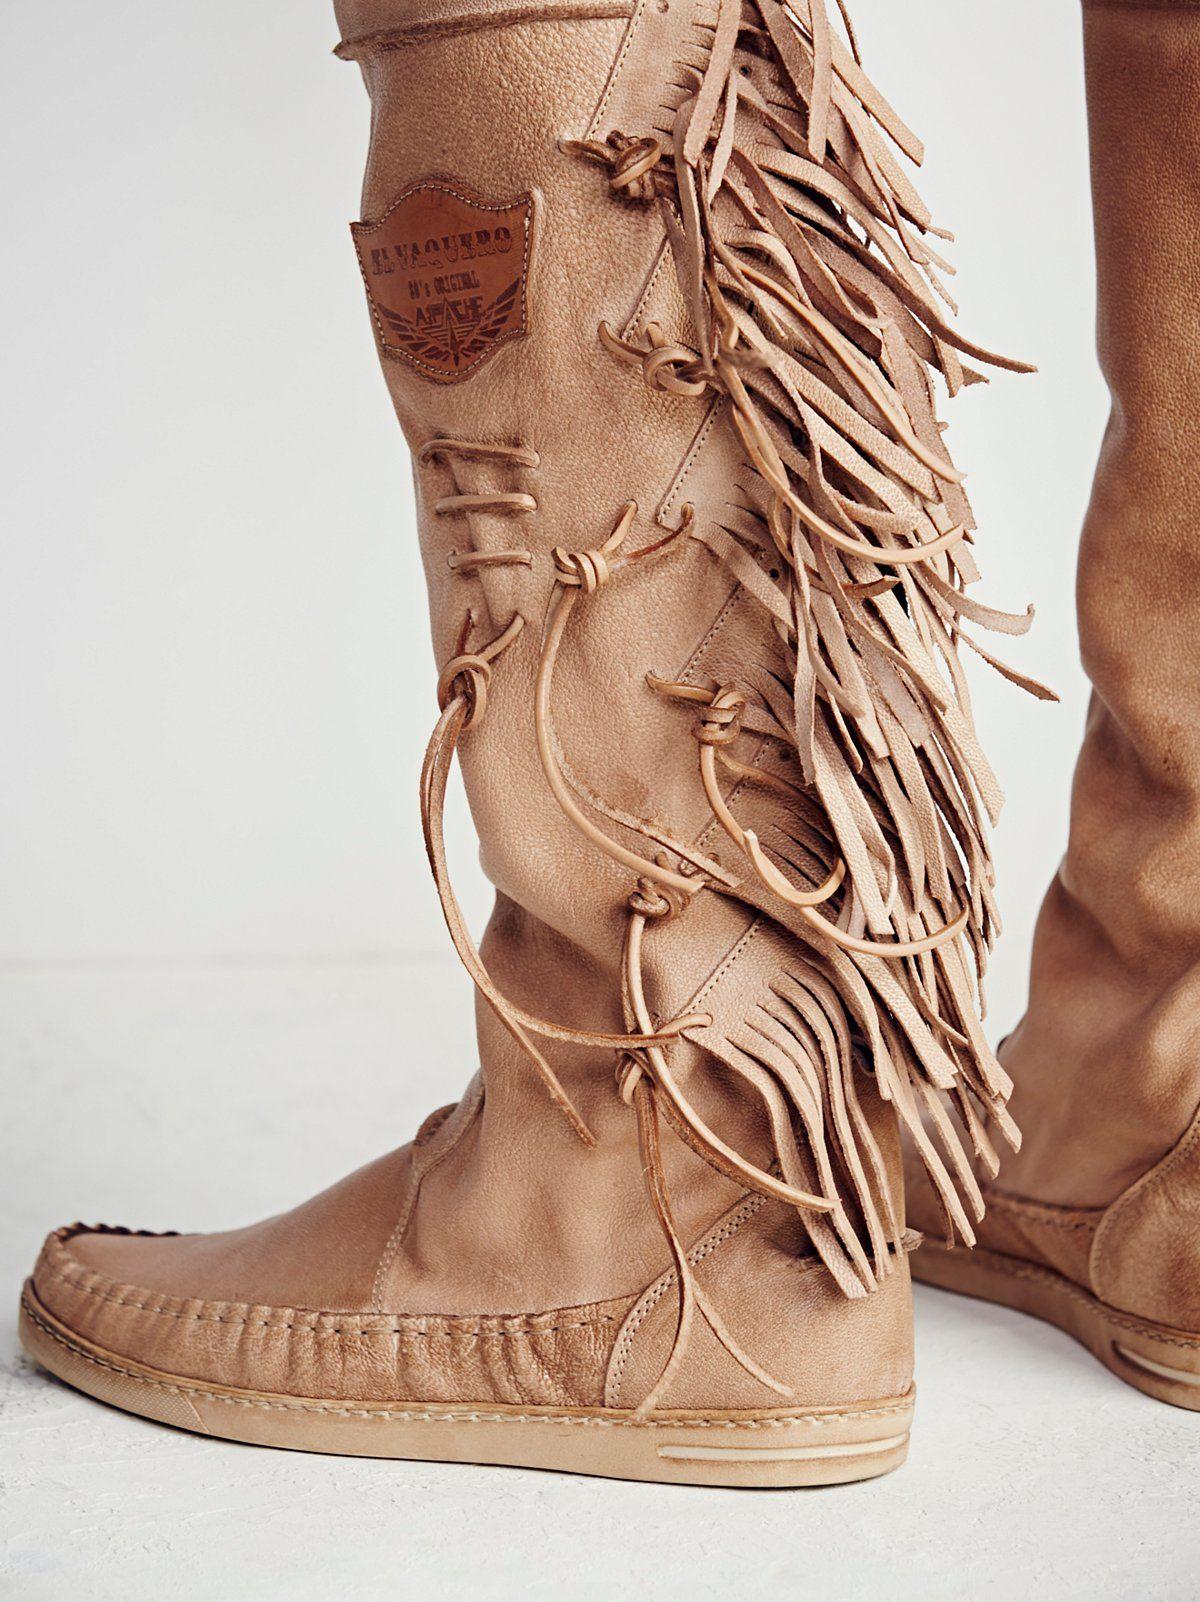 Carpario Tall Moccasin   Boots, Fringe